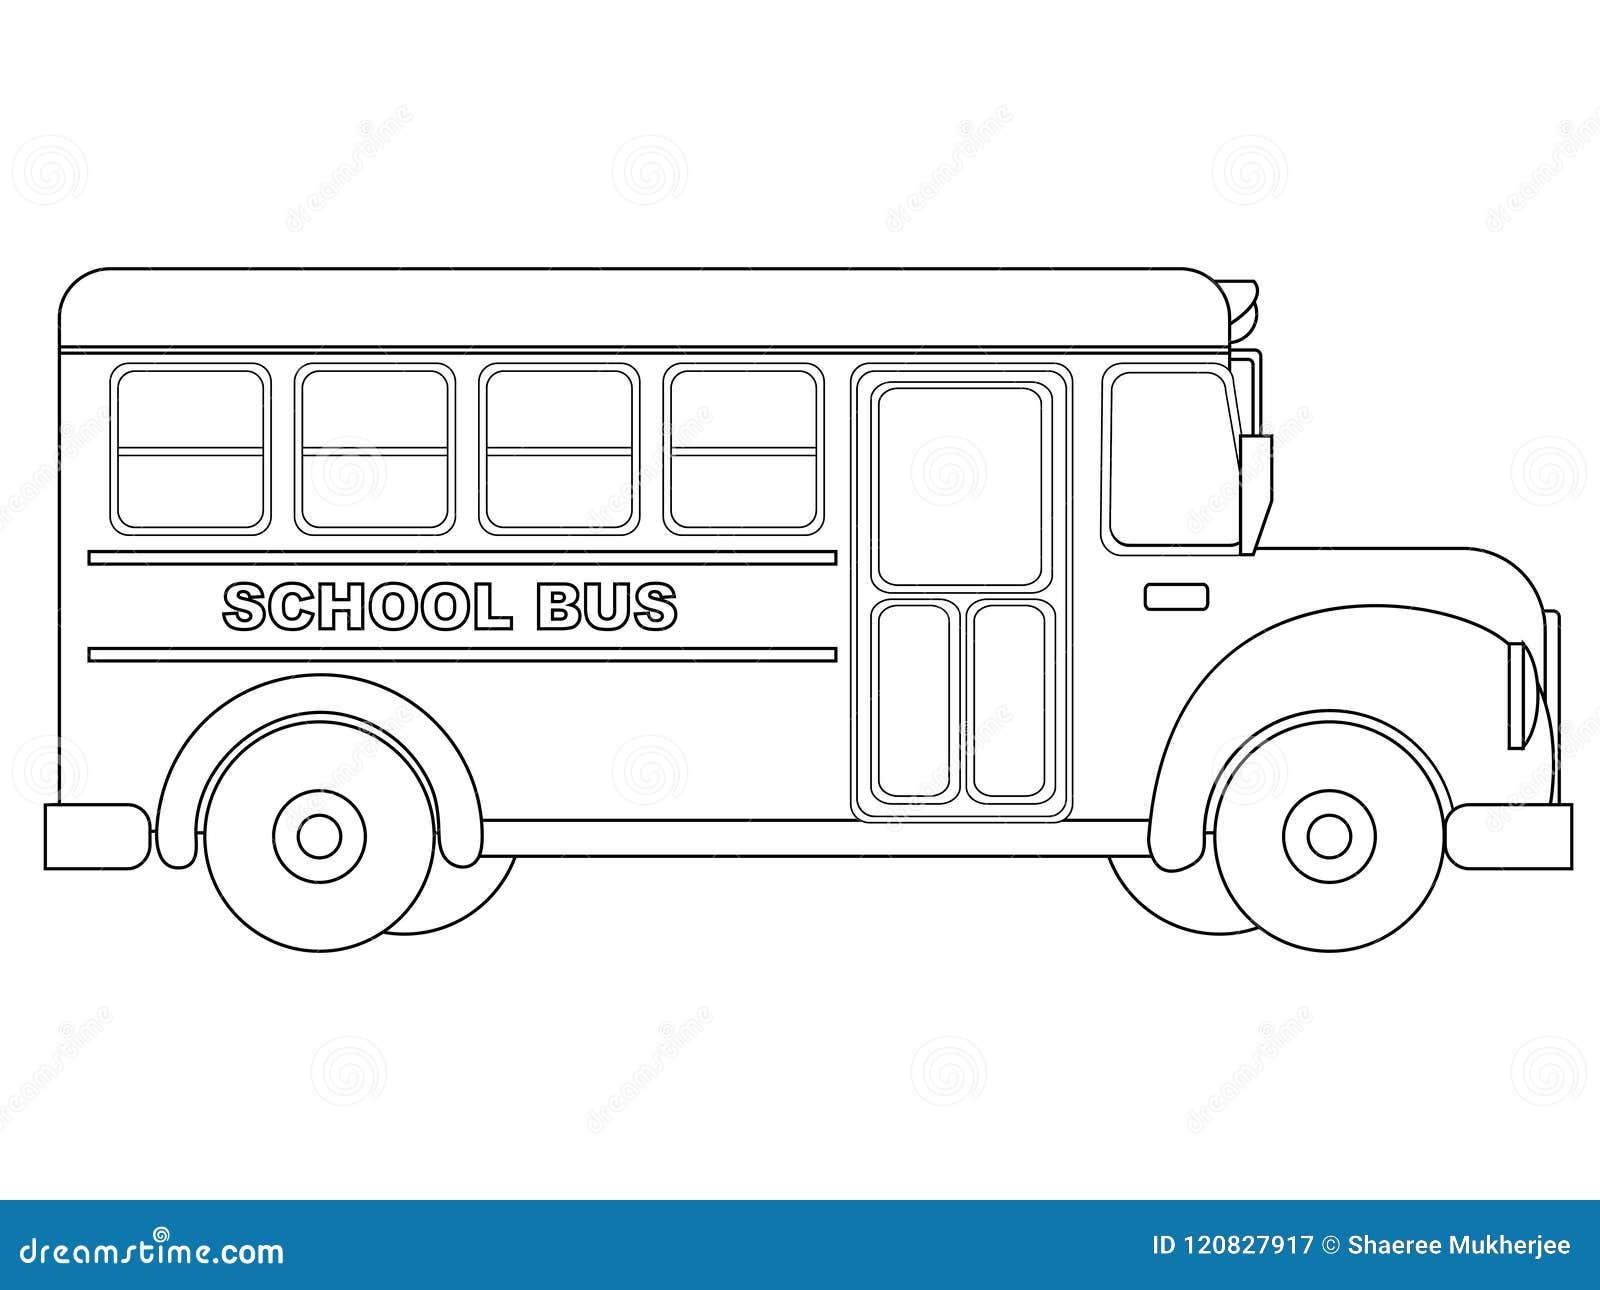 Vector Illustration School Bus Coloring Page Stock Vector ...